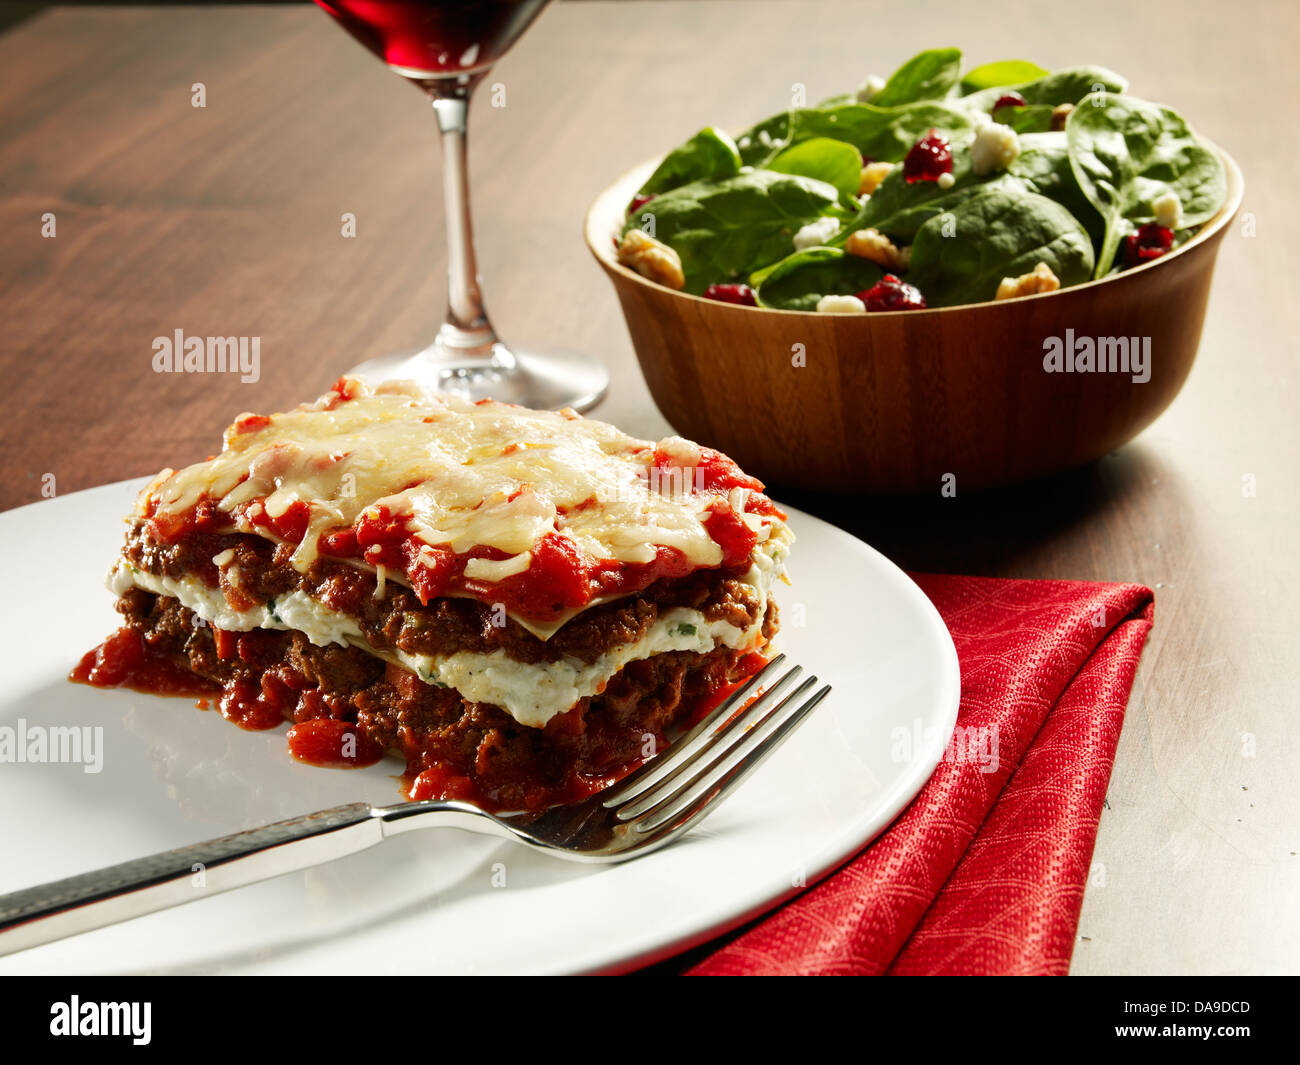 Plate of lasagna - Stock Image